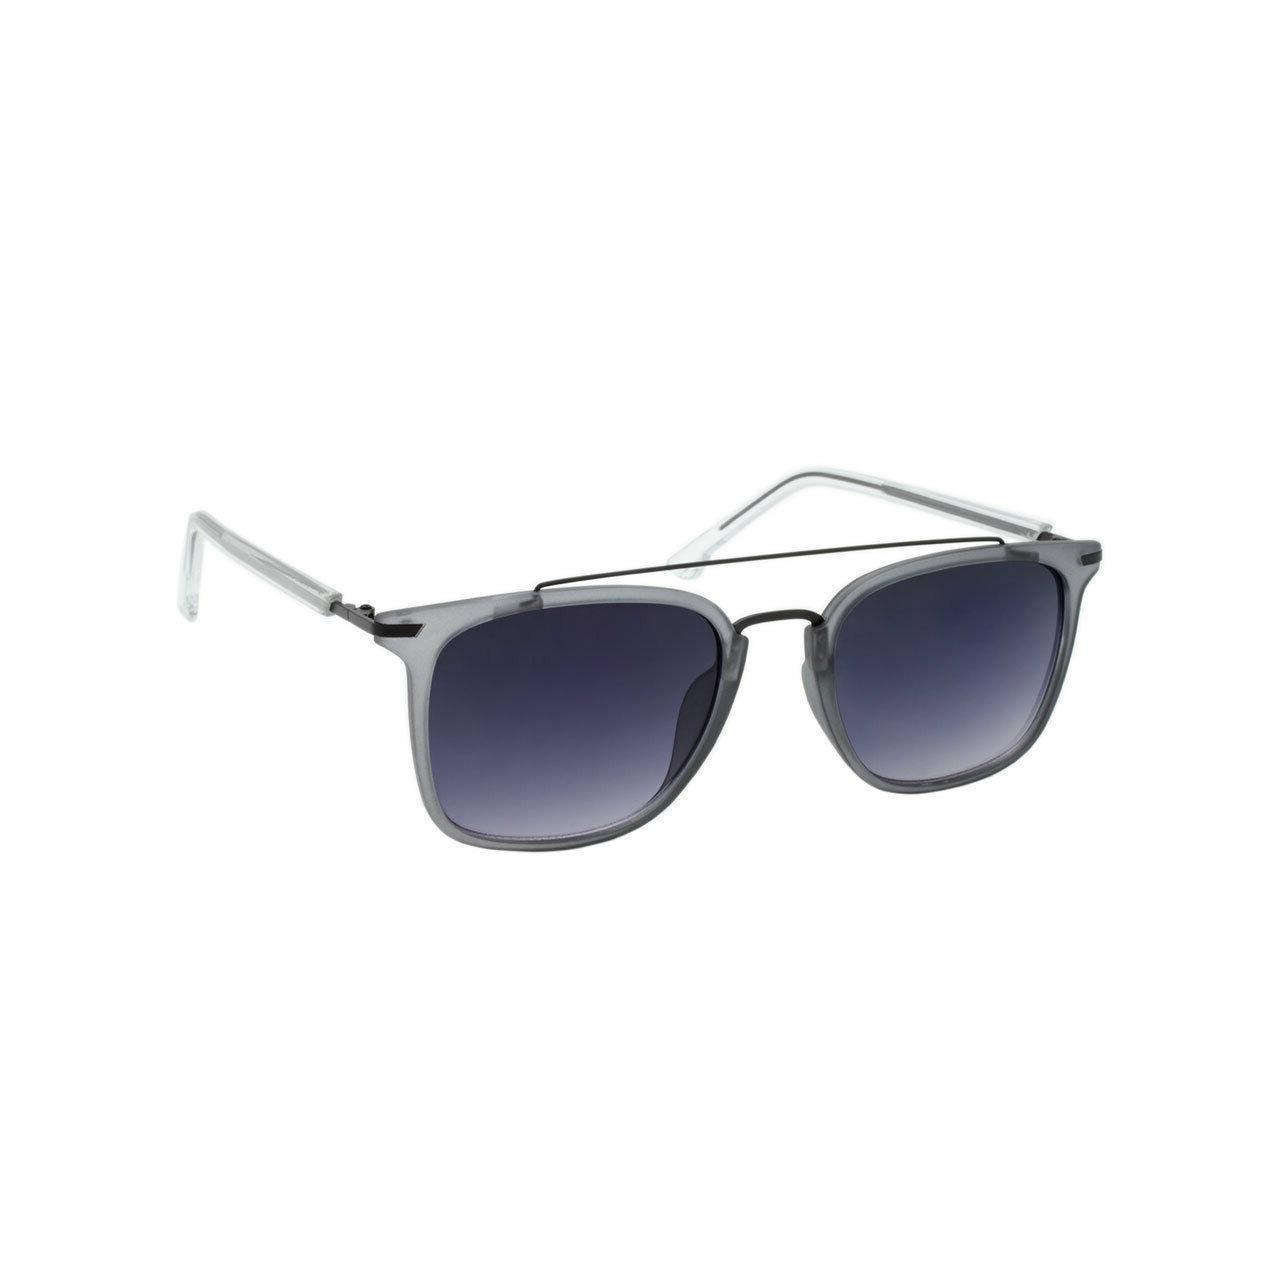 Bulk 50 Fashion Sunglasses Assorted Men Styles